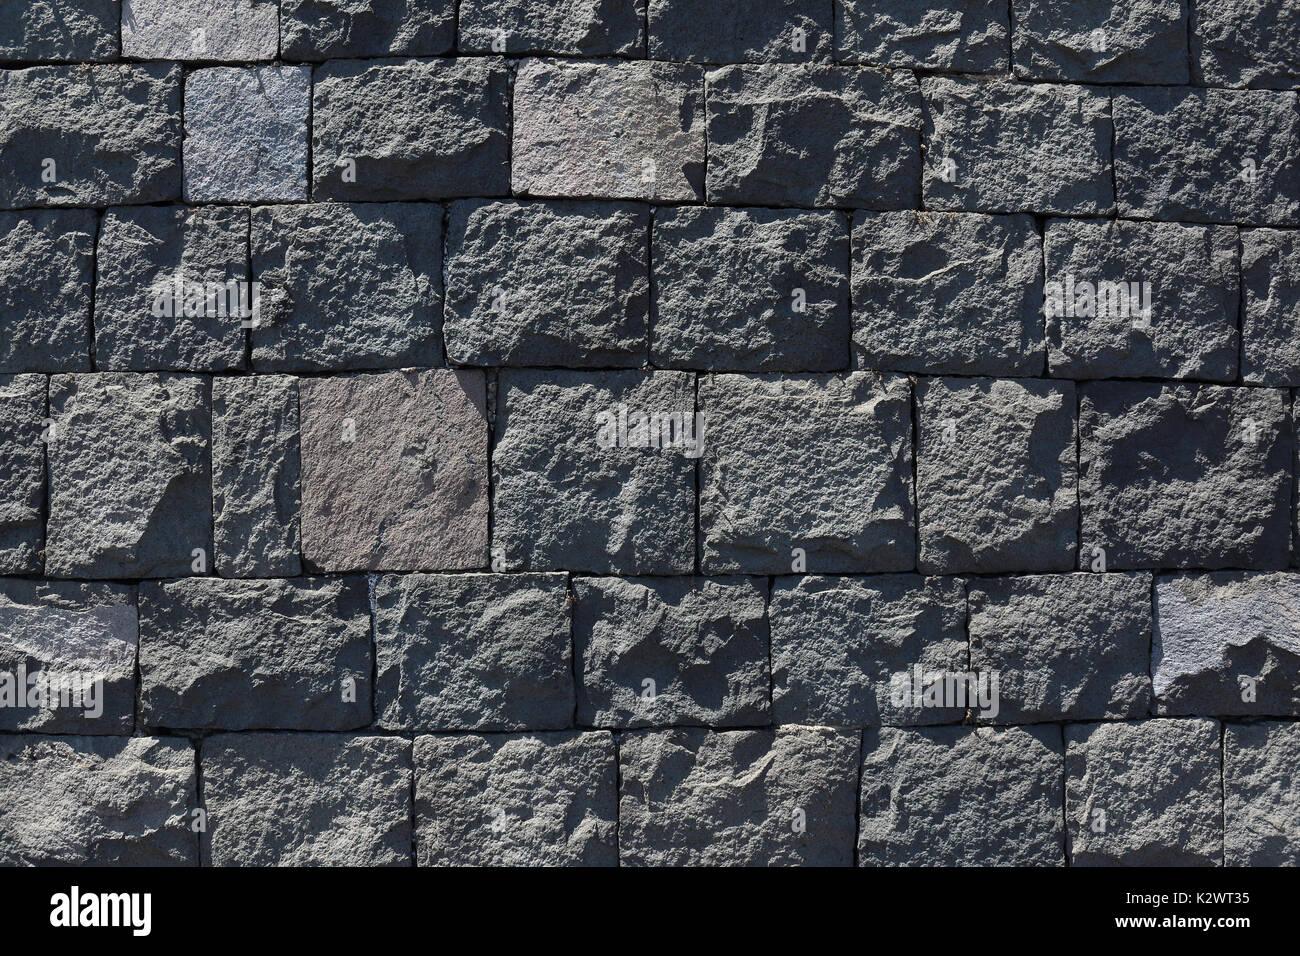 Basalt And Granite : Basalt blocks stock photos images